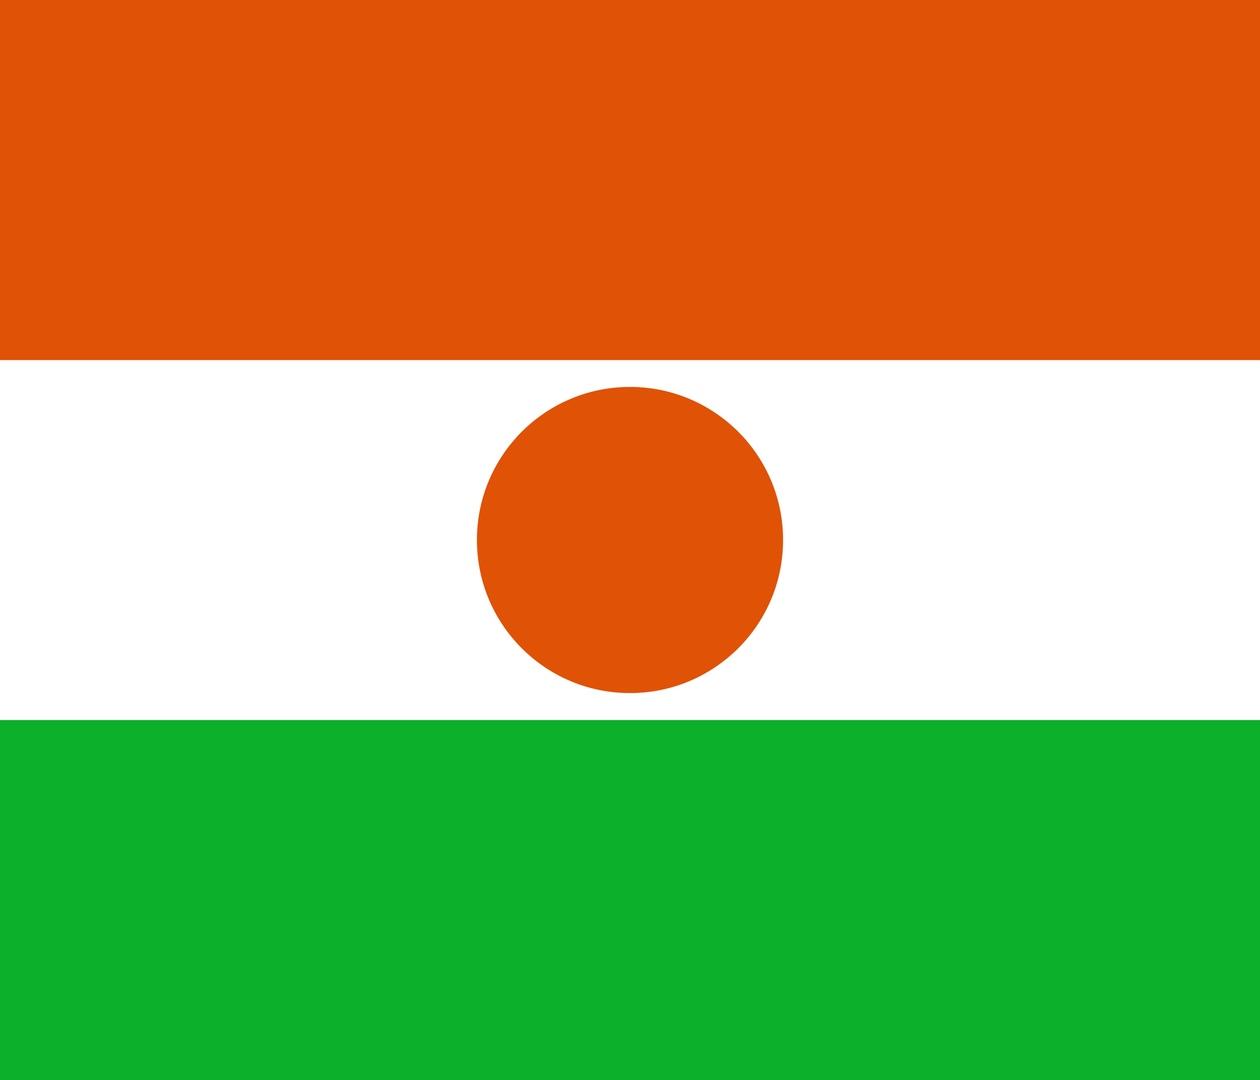 Флаг Нигер